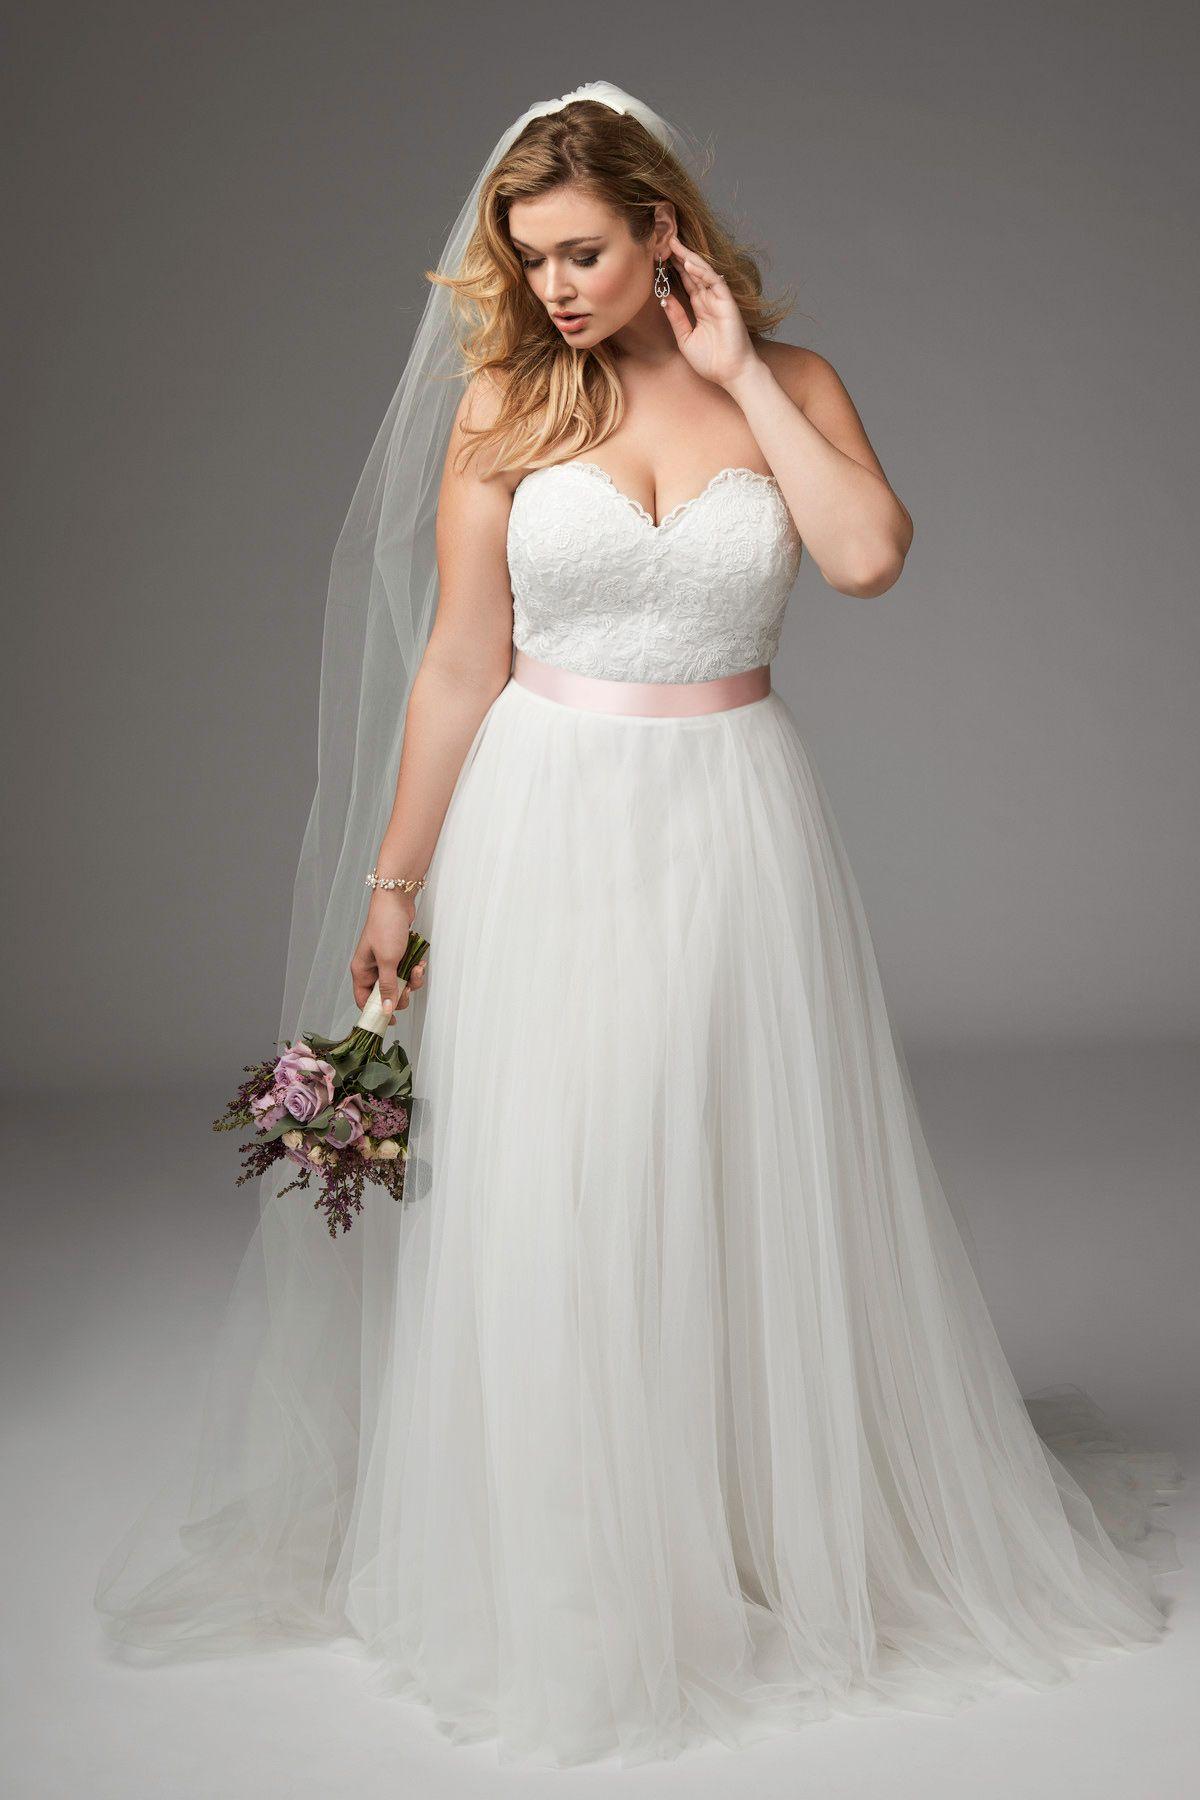 Agatha Plus size bridal dresses, Aline wedding dress